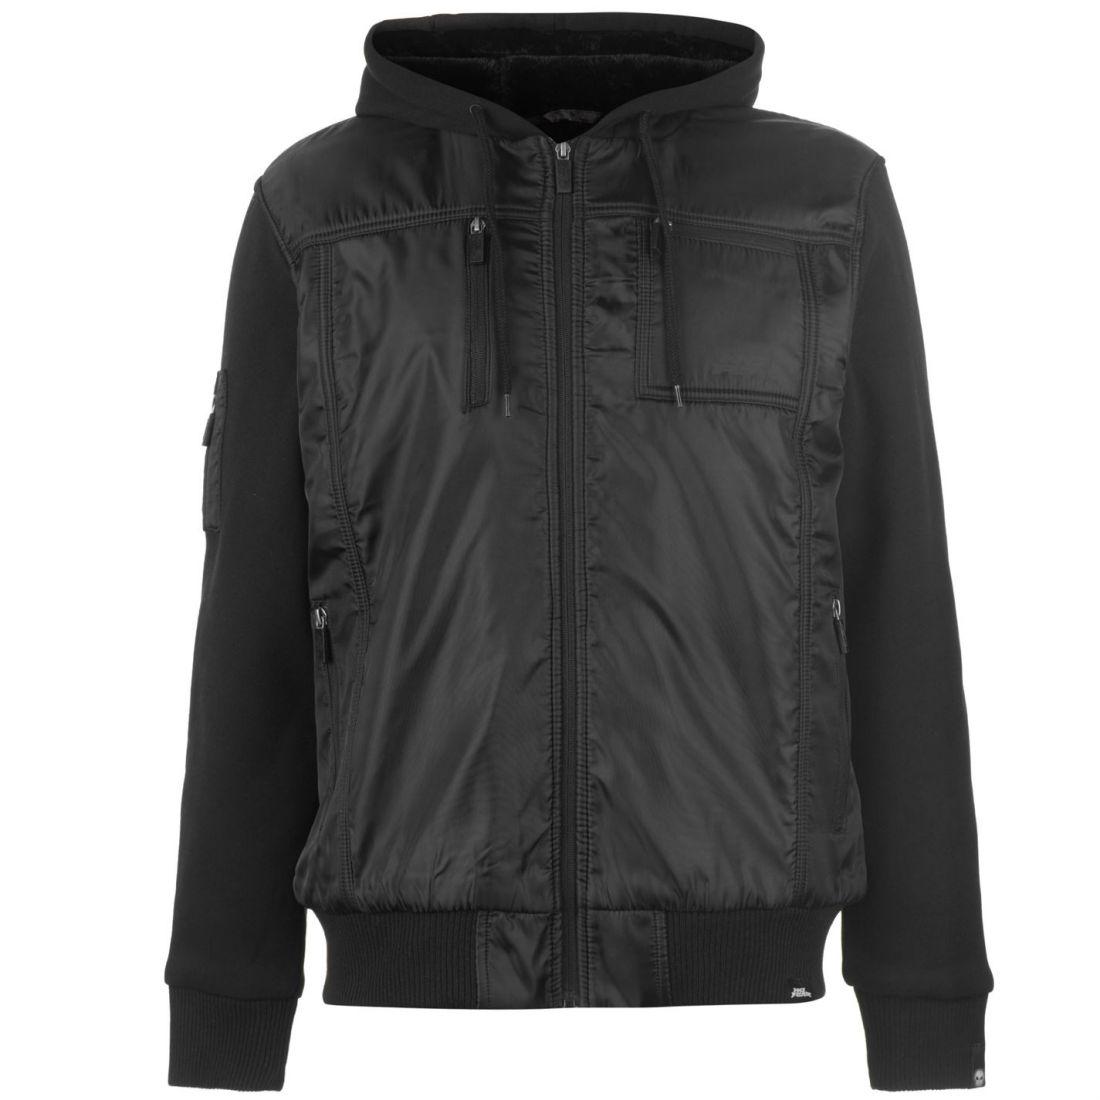 b861196428 No Fear Mens Lined Zip Jacket Padded Coat Top Long Sleeve Hooded ...